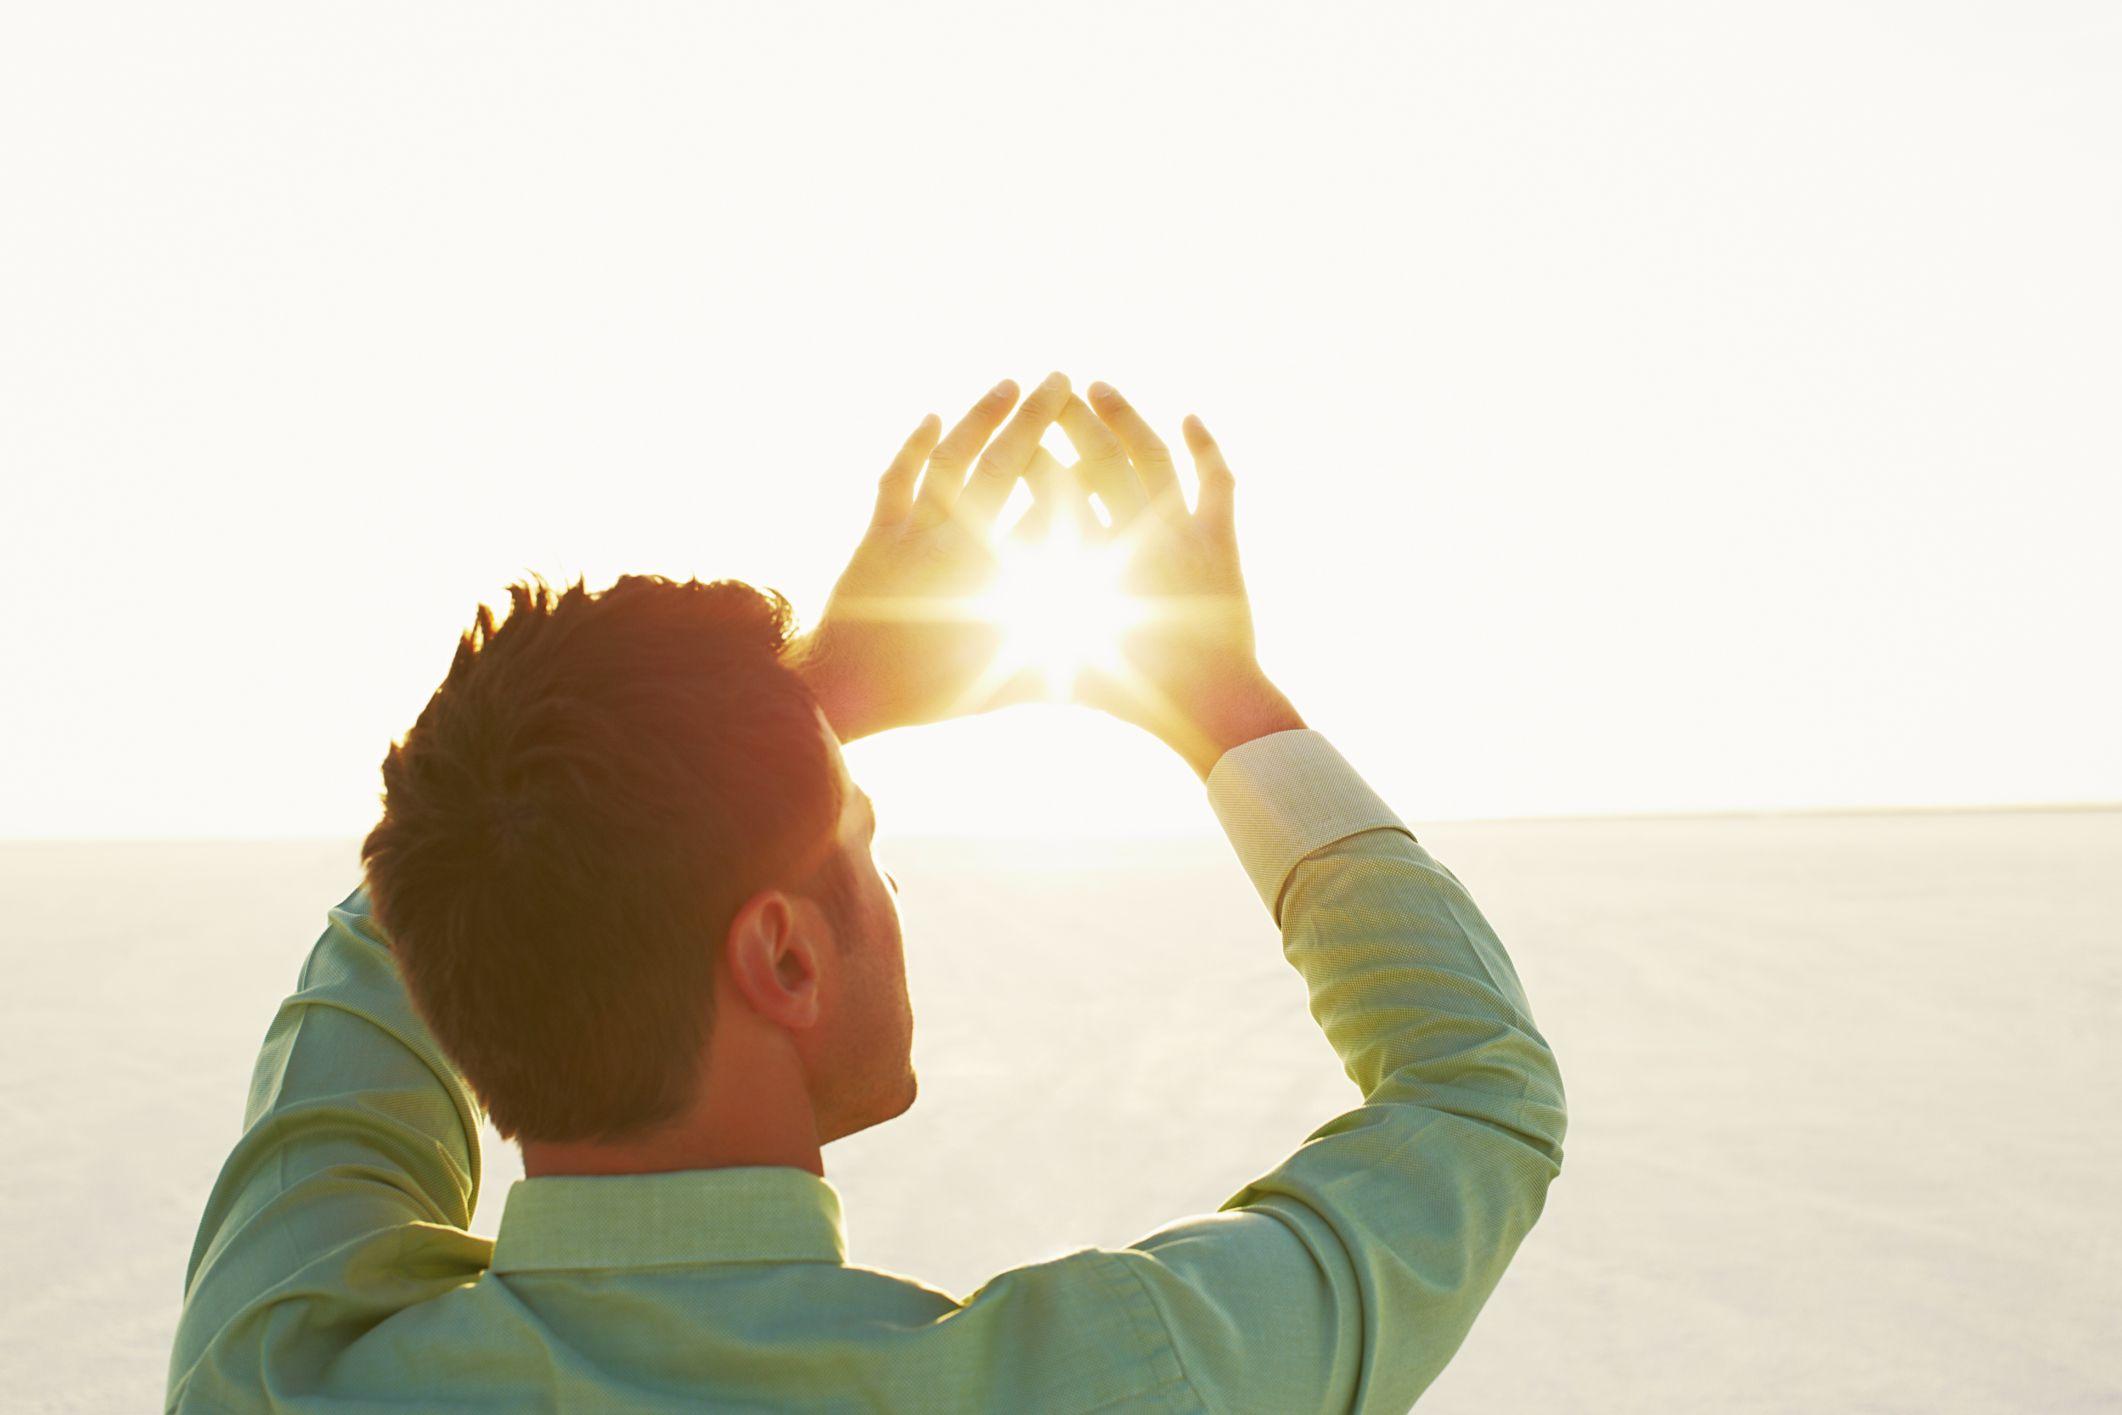 goals-optimism-sunlight-hands-Andy-Ryan.jpg